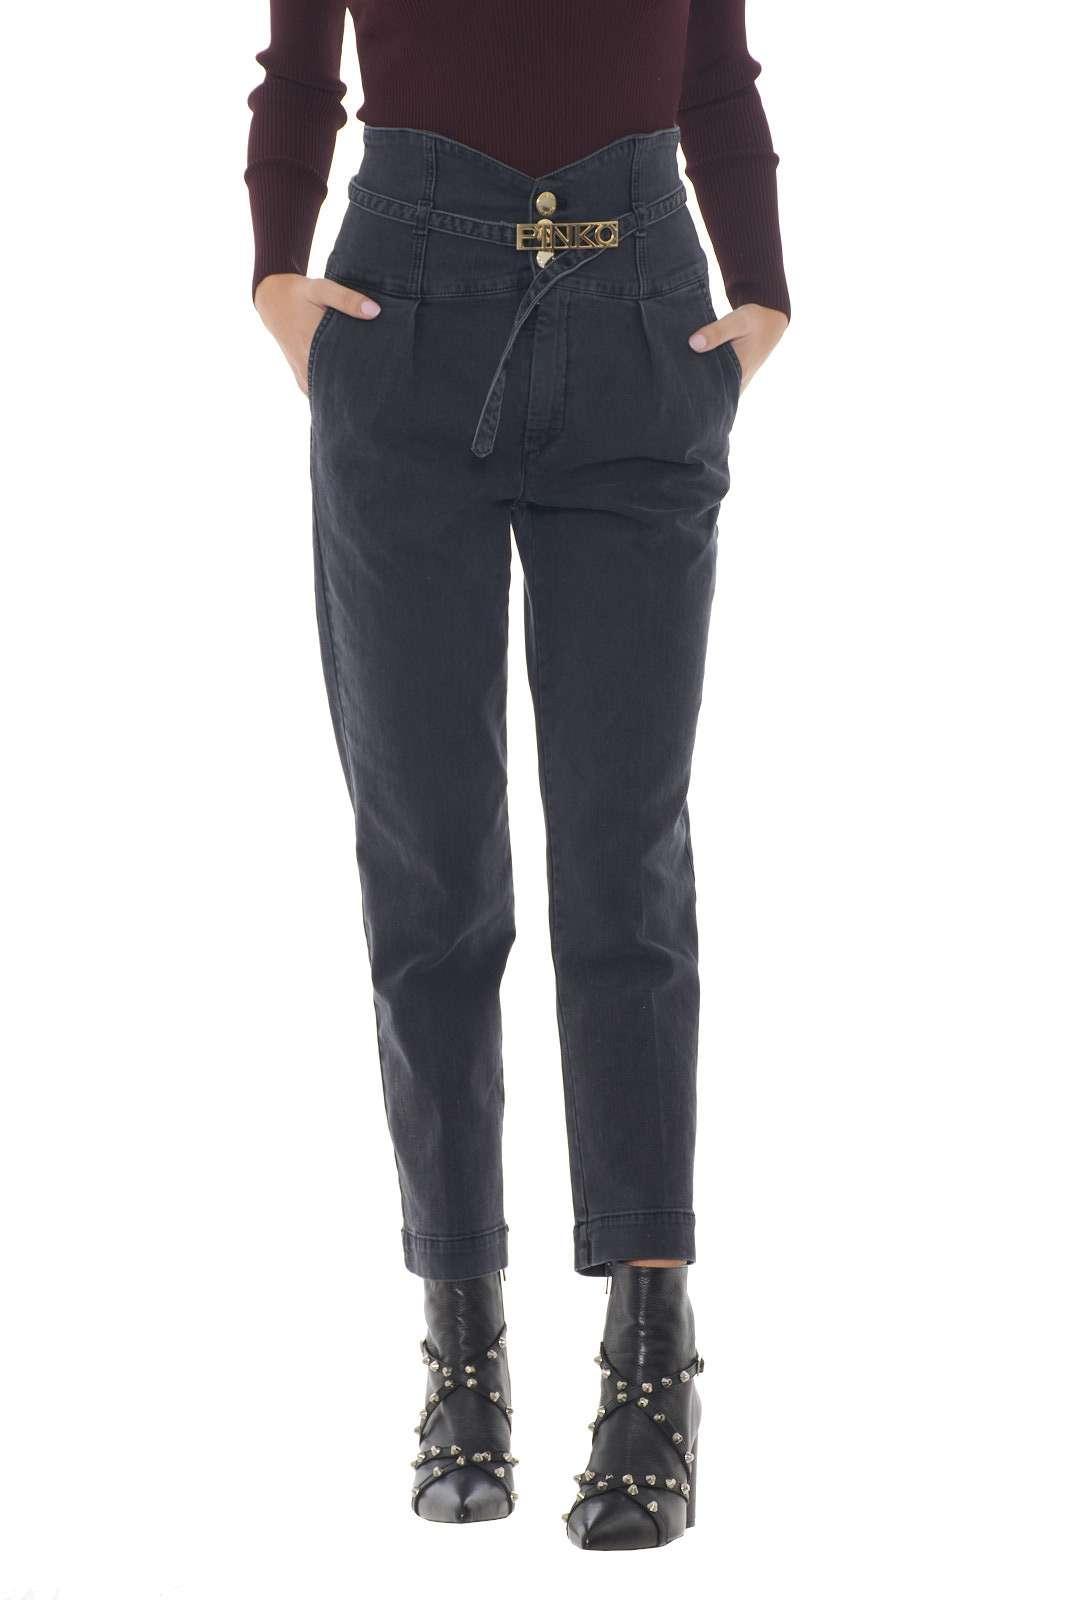 https://www.parmax.com/media/catalog/product/a/i/AI-outlet_parmax-pantaloni-donna-Pinko-1j10aj-A.jpg